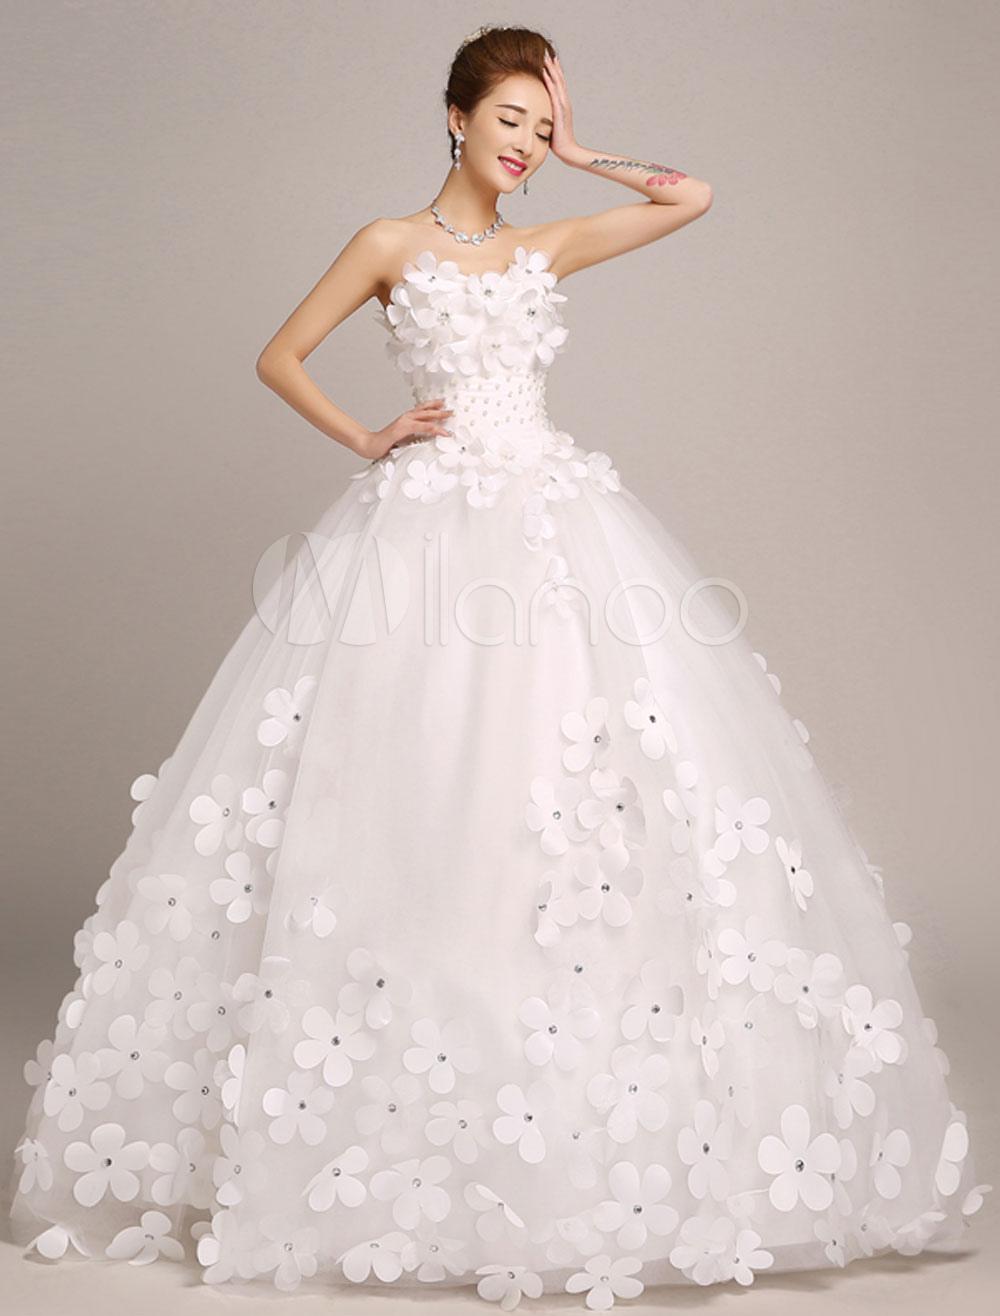 Ivory Wedding Dresses Princess Ball Gowns Bridal Dress 3D Flowers ...